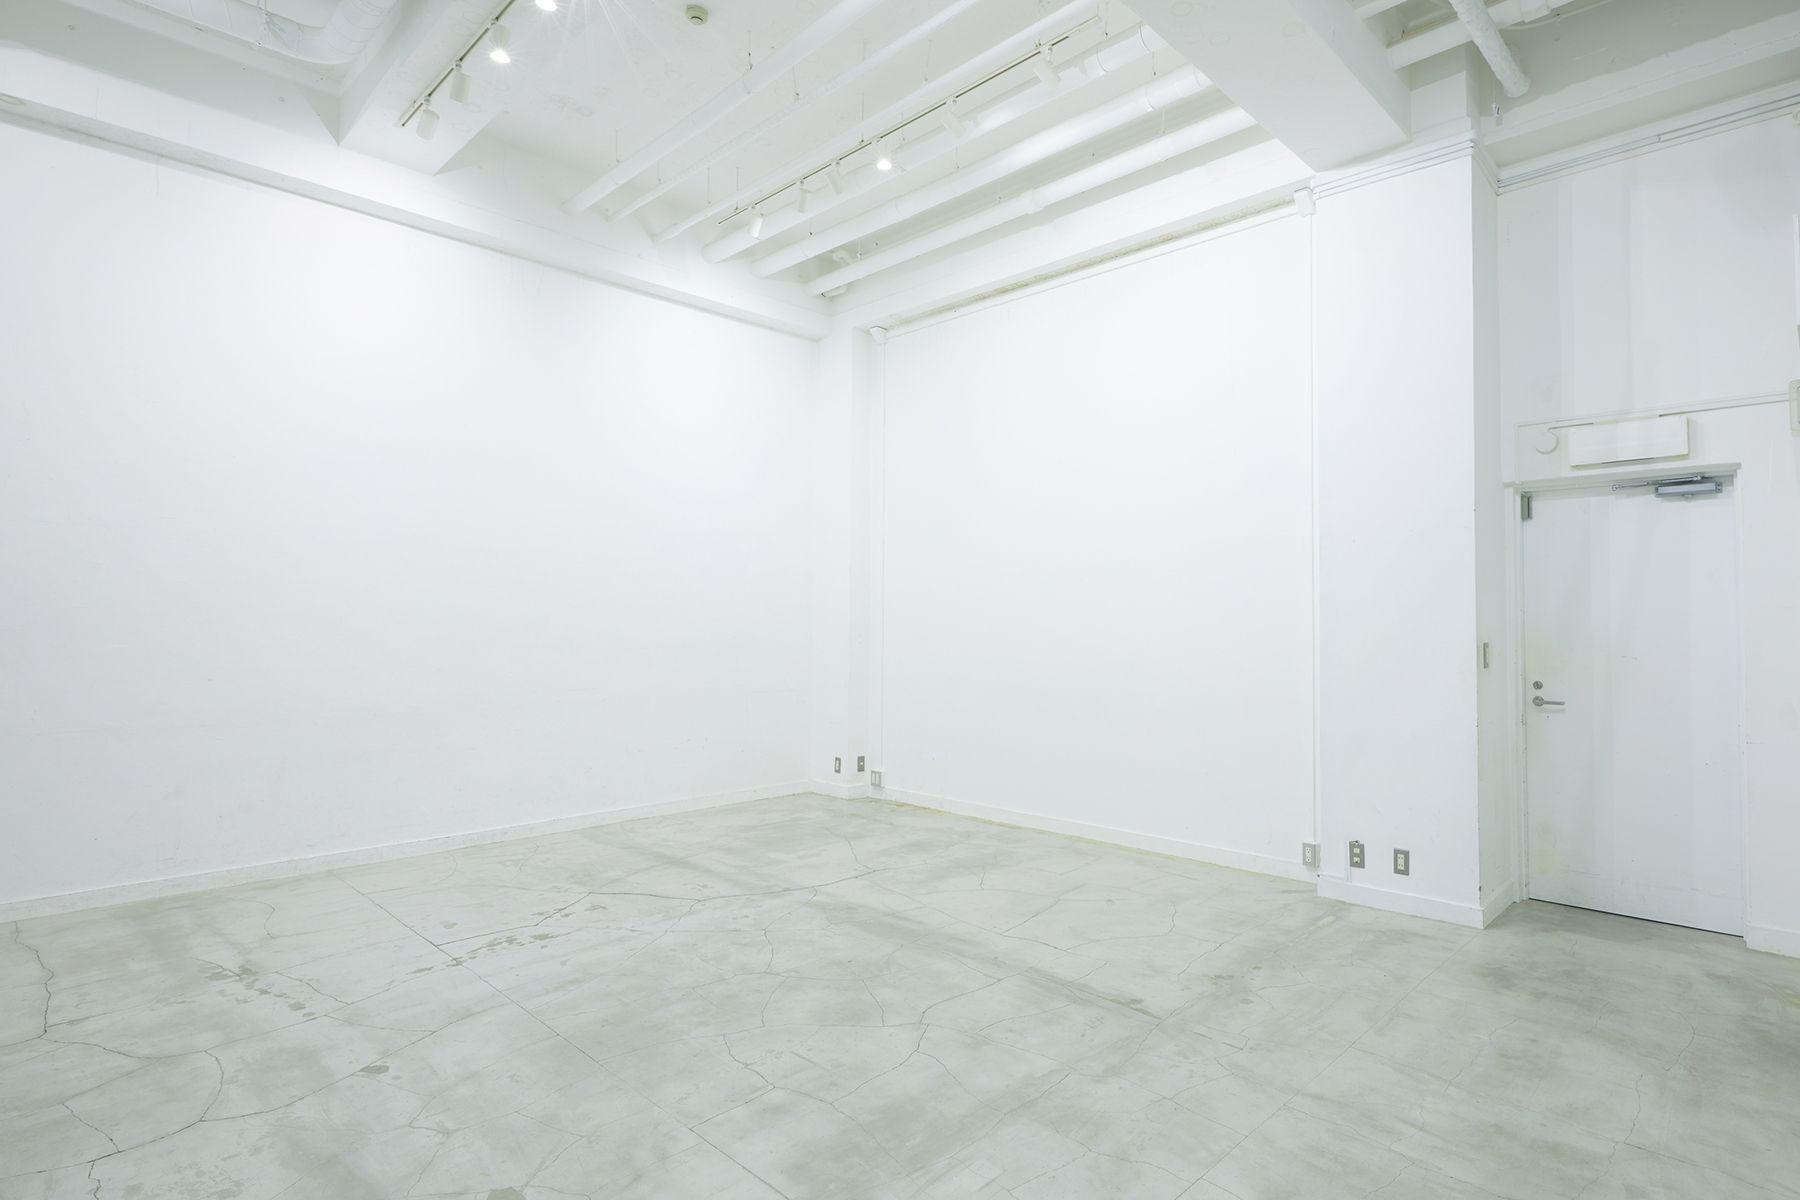 sinca studio 中野坂上 (シンカ スタジオ)ライト機材の持込み自由